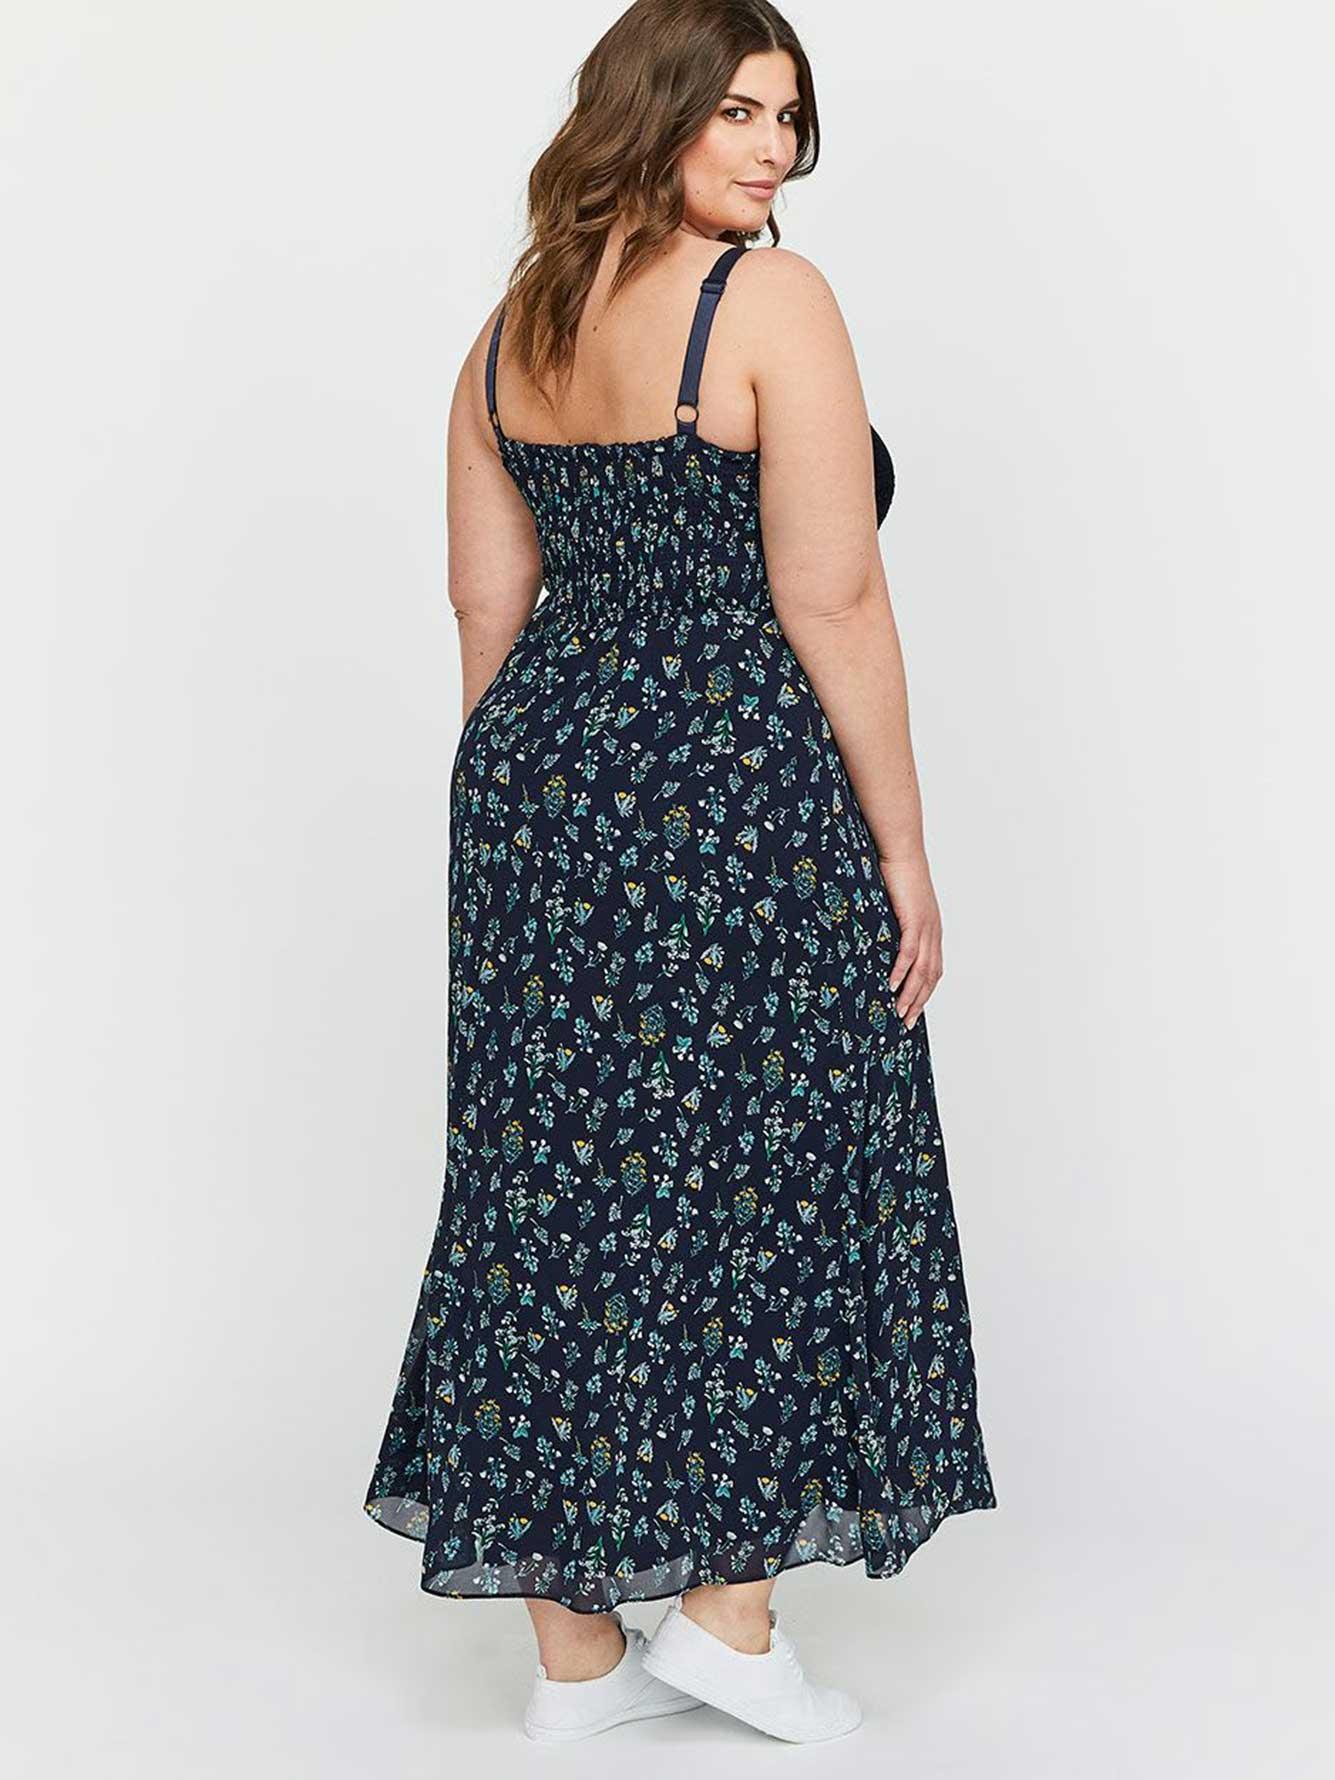 dbc30045be9c Michel Studio A-Line Empire Waist Mixed Fabric Maxi Dress   Addition ...